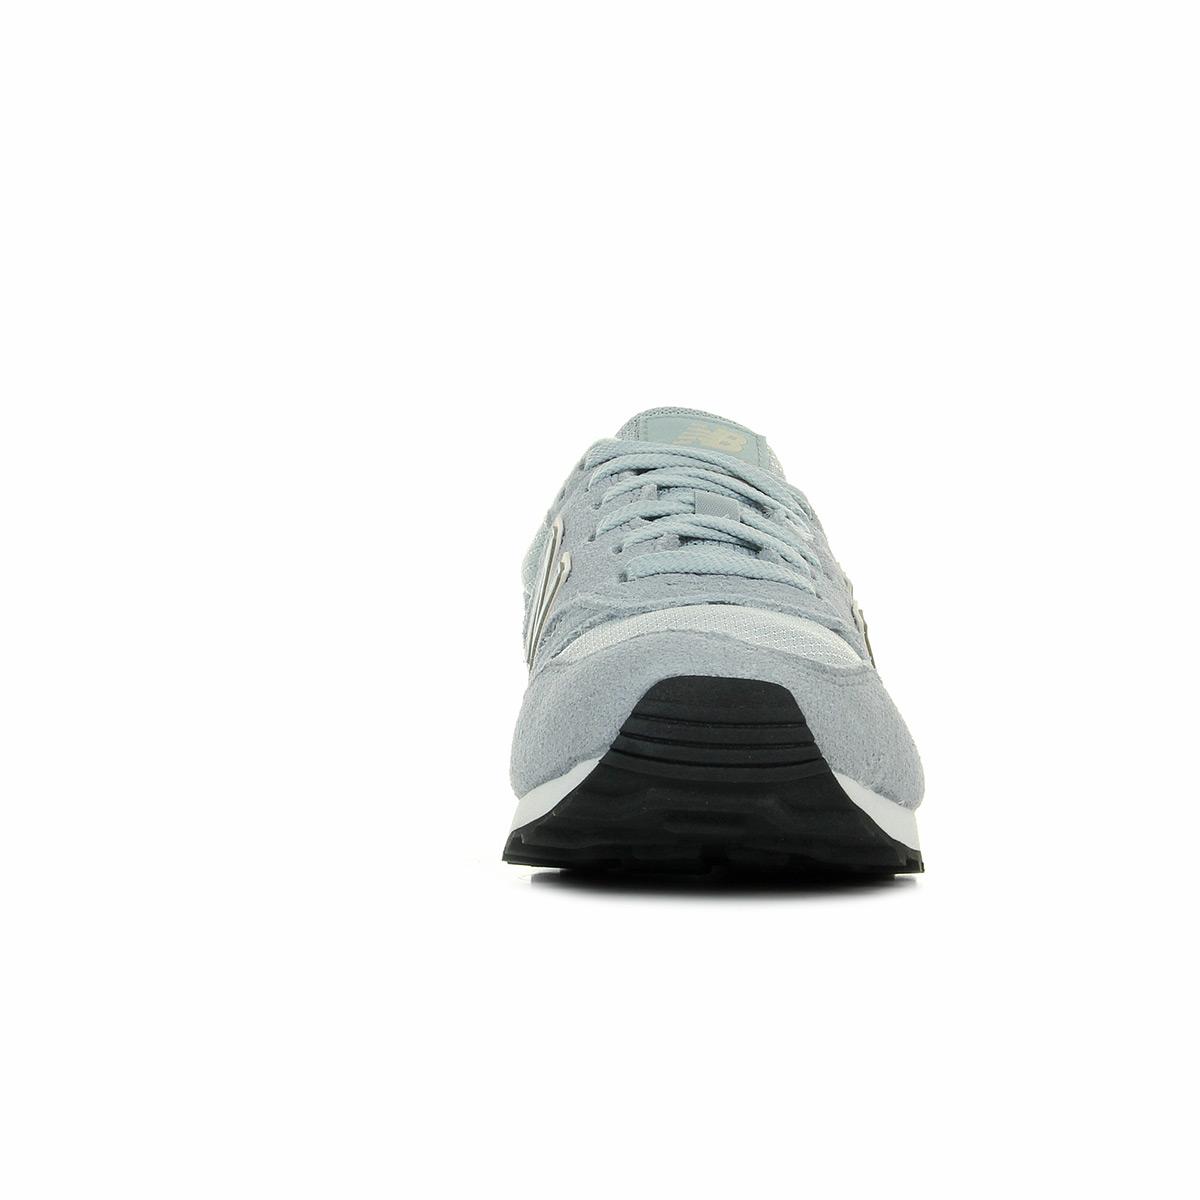 New Wl373 Baskets Balance Femme Gry Wl373gry Mode CCwUZxBr